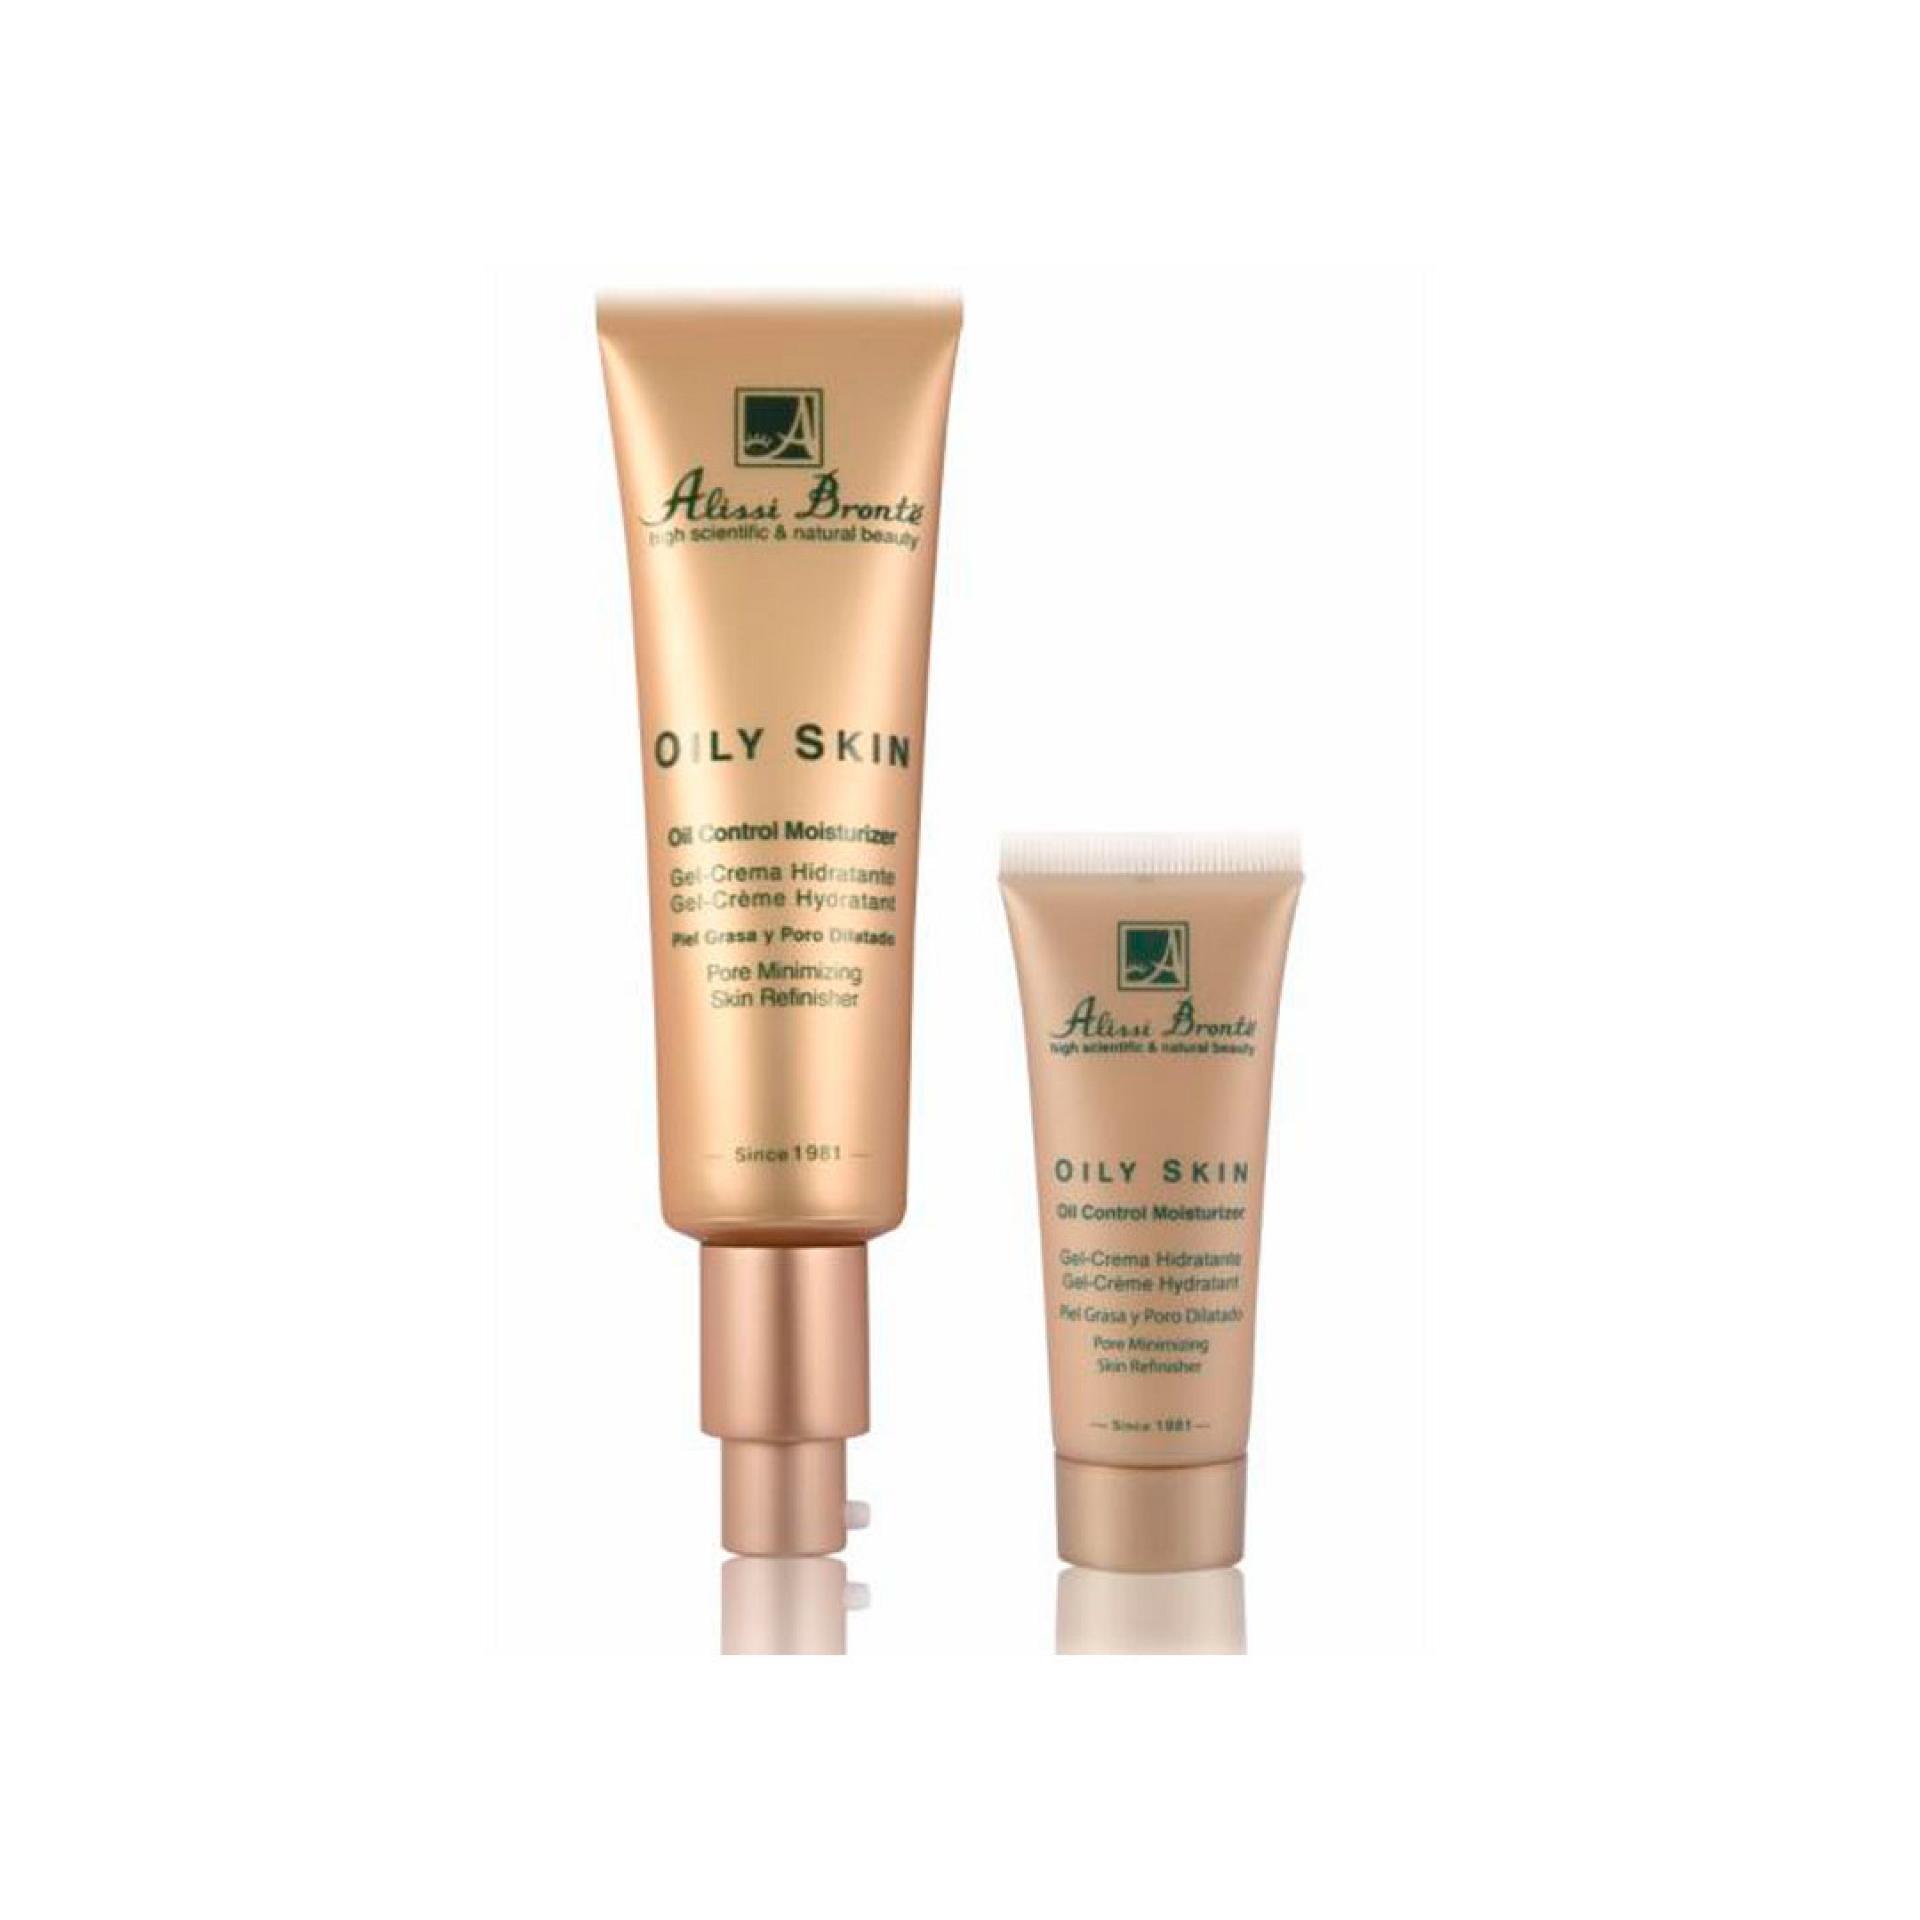 Oily Skin Gel-Crema Hidratante Piel Grasa Alissi Brontë®